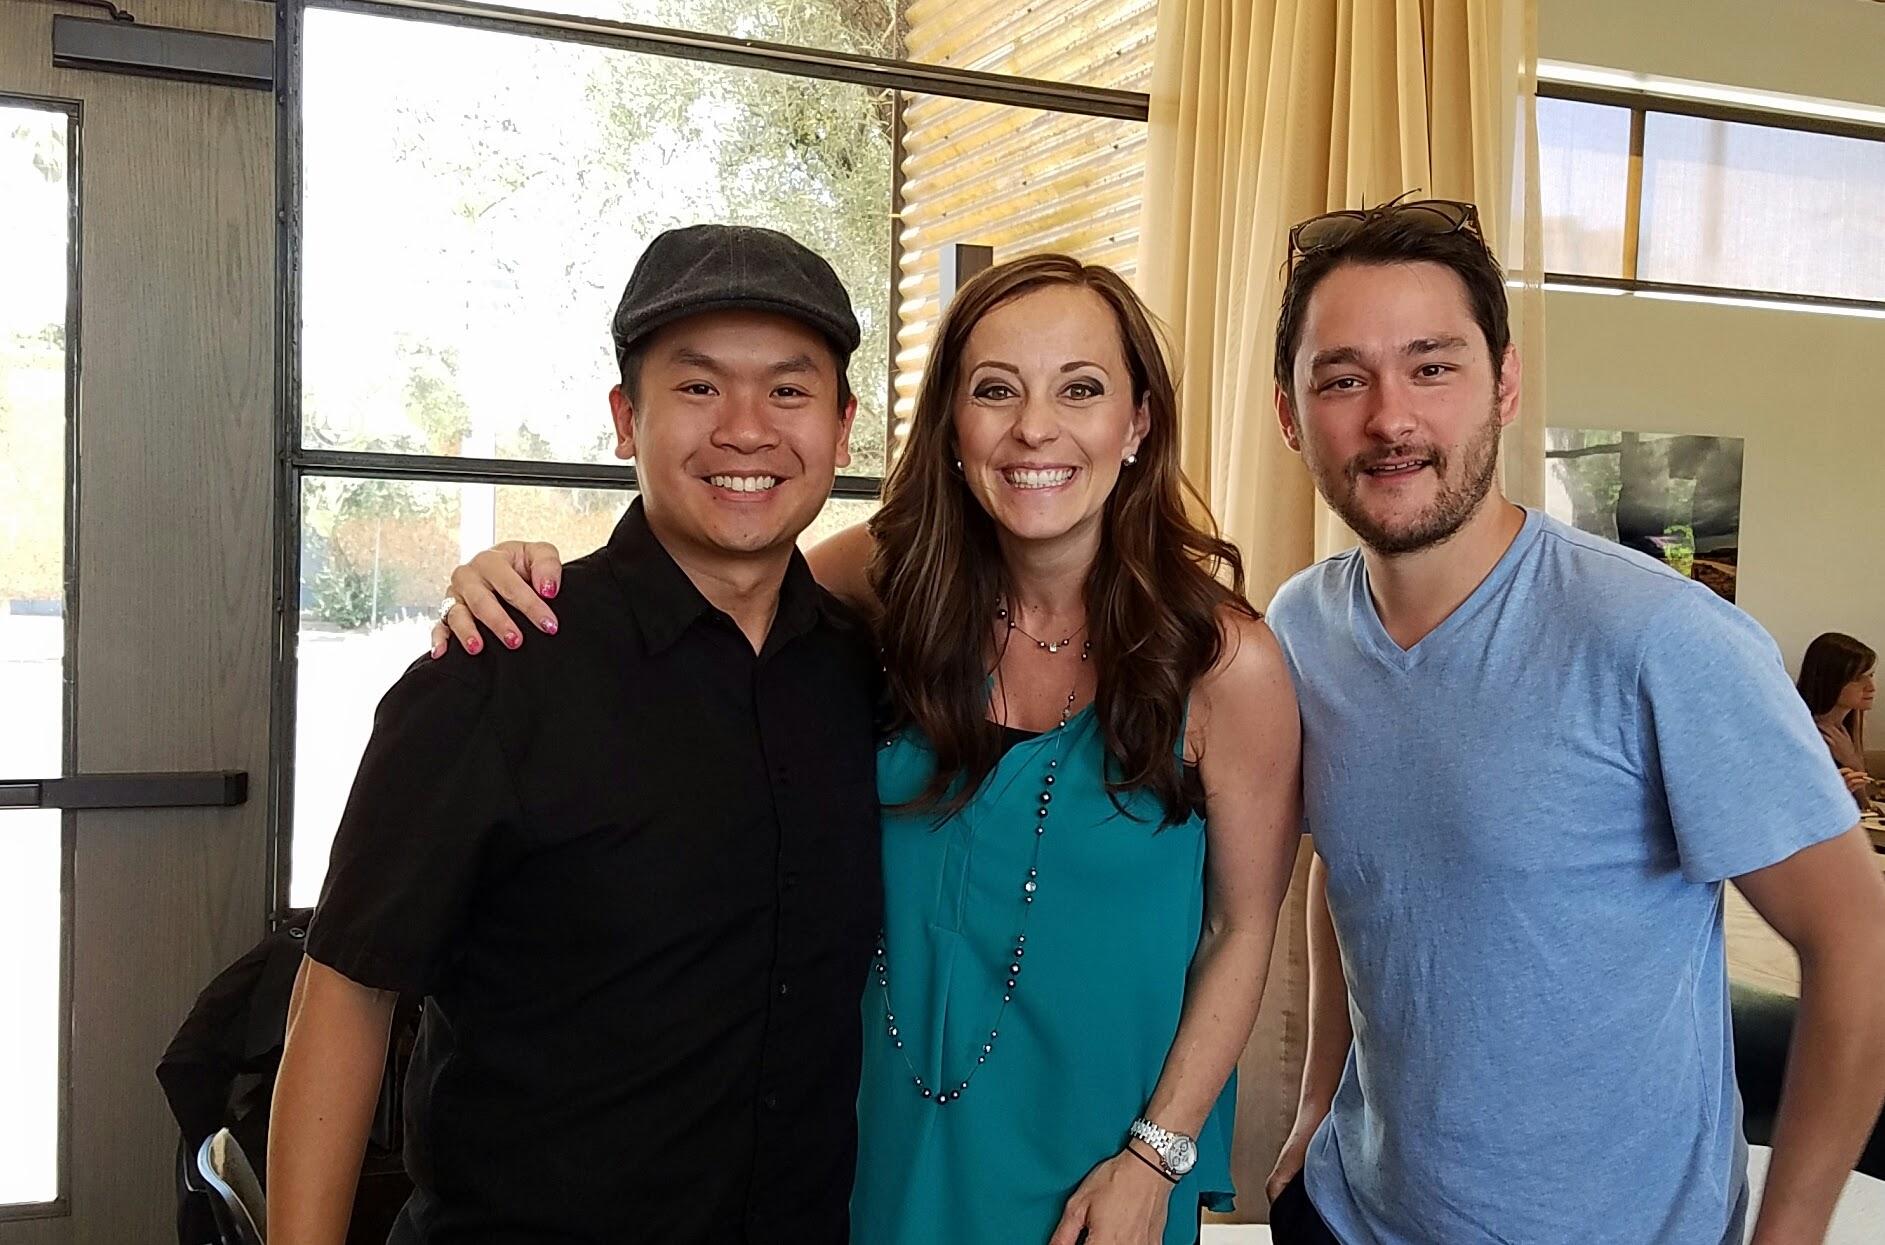 Andrew Gooi, Stephanie Sanstead and Chef Ryan Swanson